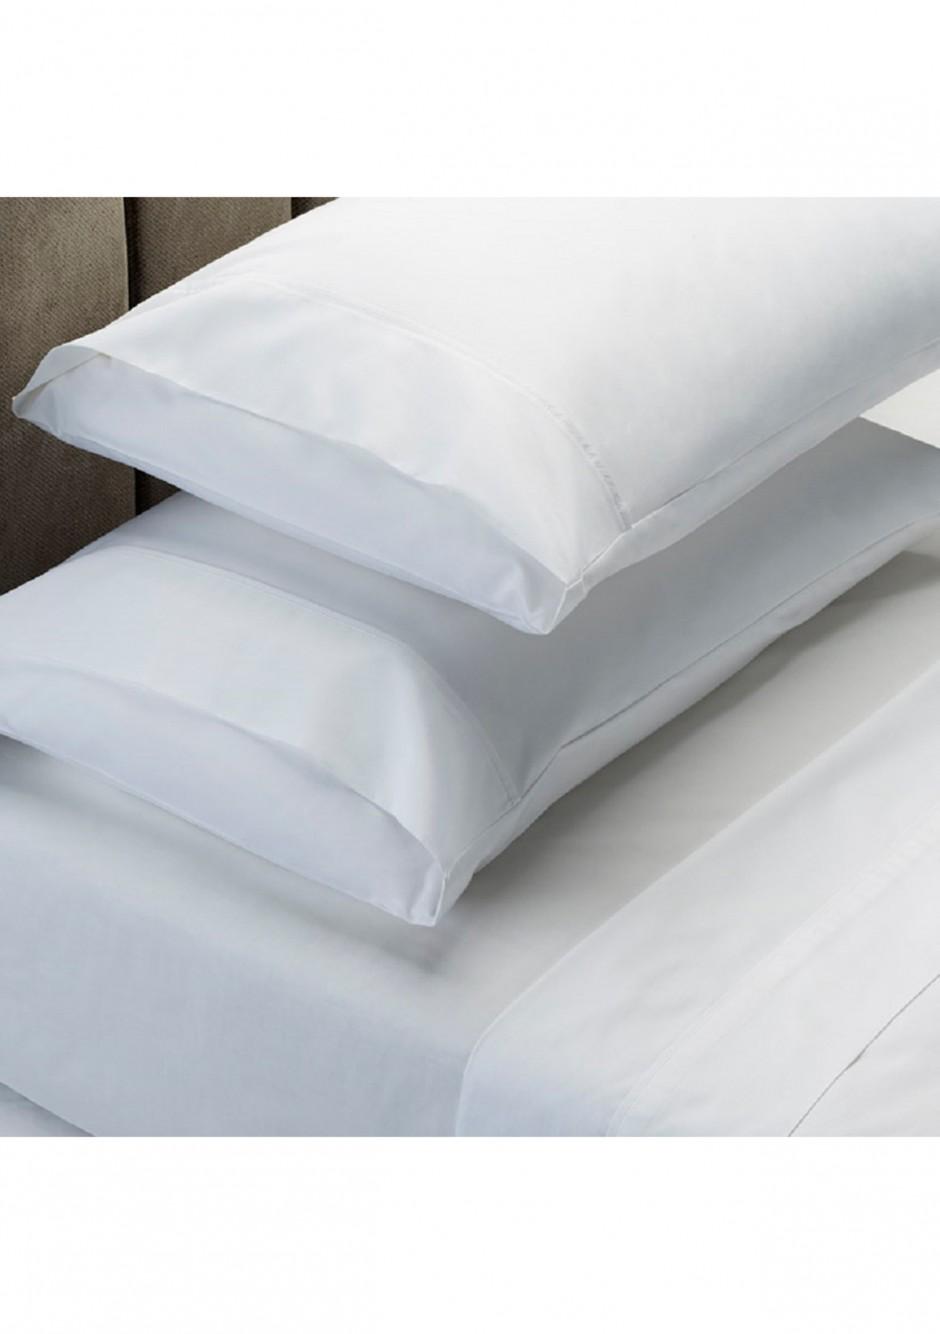 Egyptian Cotton Sheets   Sheets Of Egyptian Cotton   1000 Egyptian Cotton Sheets